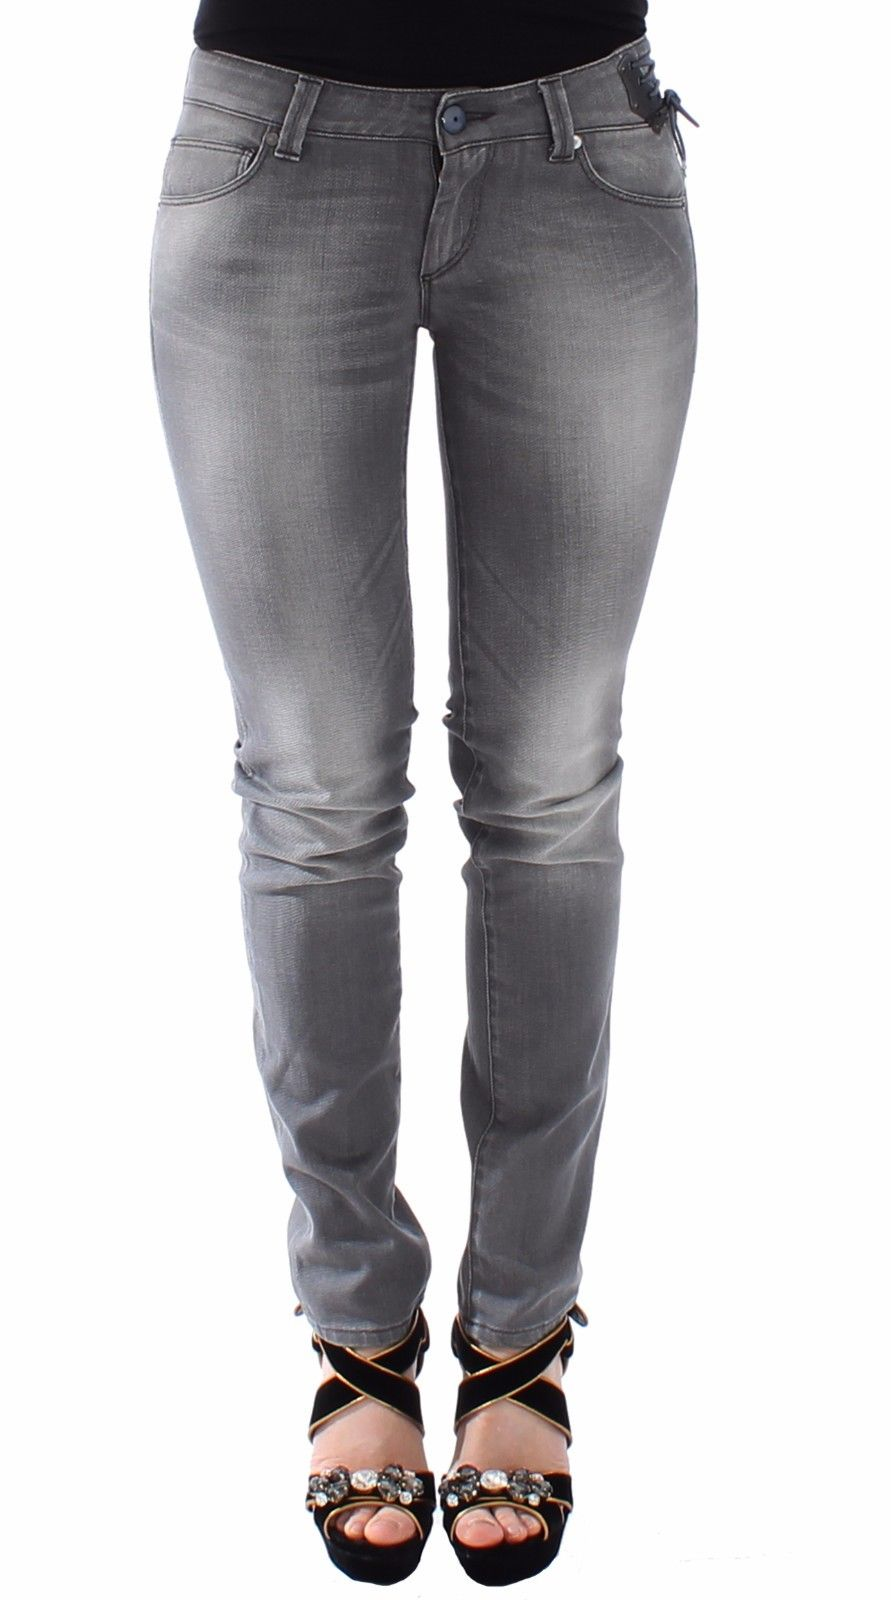 Ermanno Scervino Women's Slim Jeans Grey SIG12683 - IT40